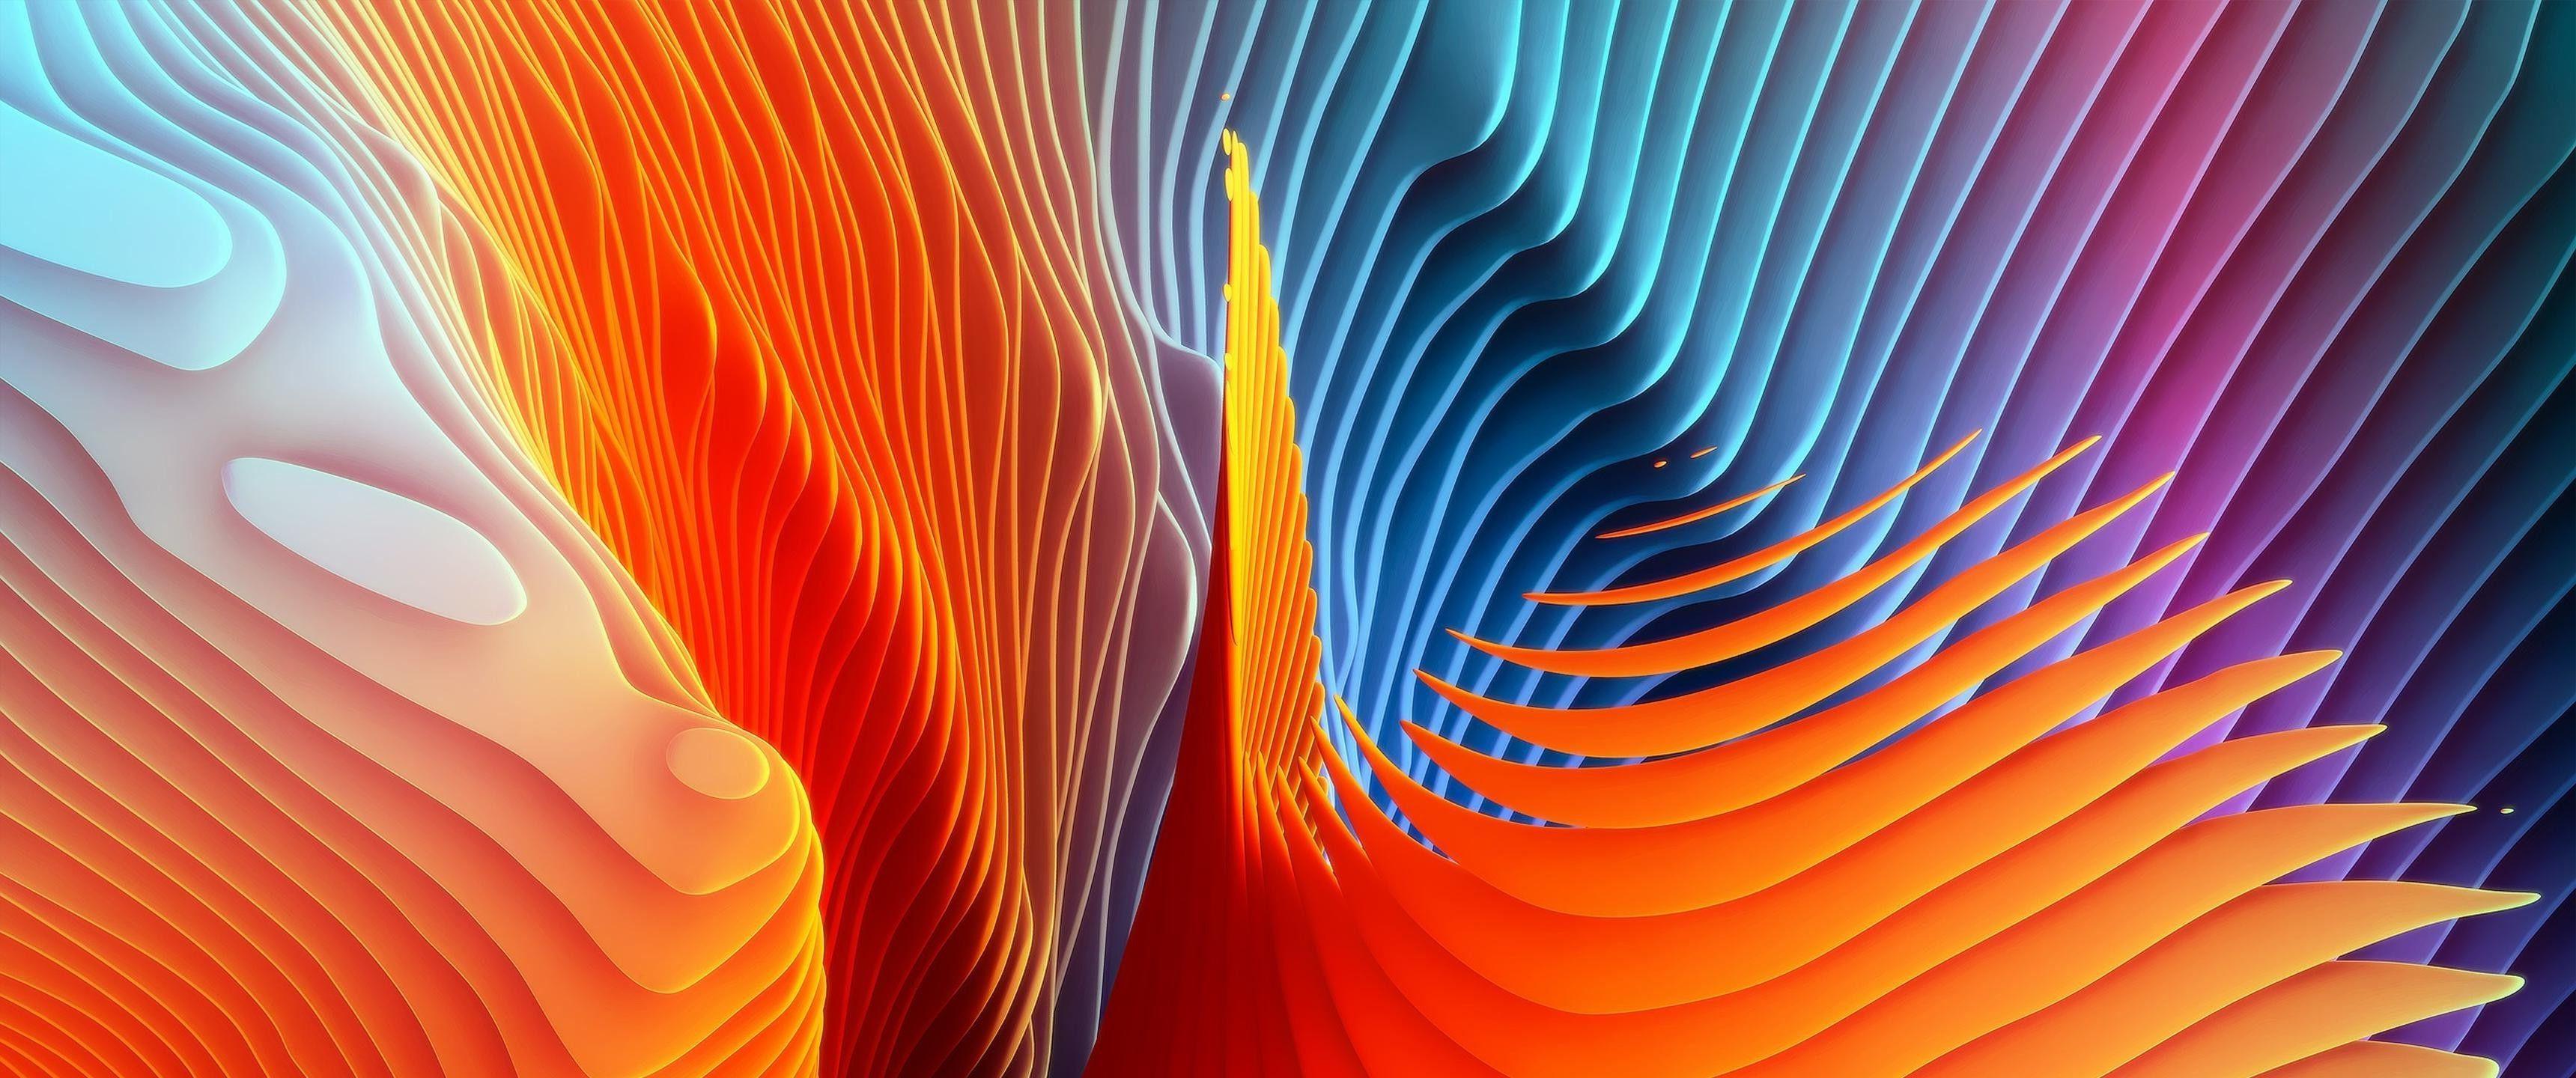 UltraWide Wallpapers - Wallpaper Cave